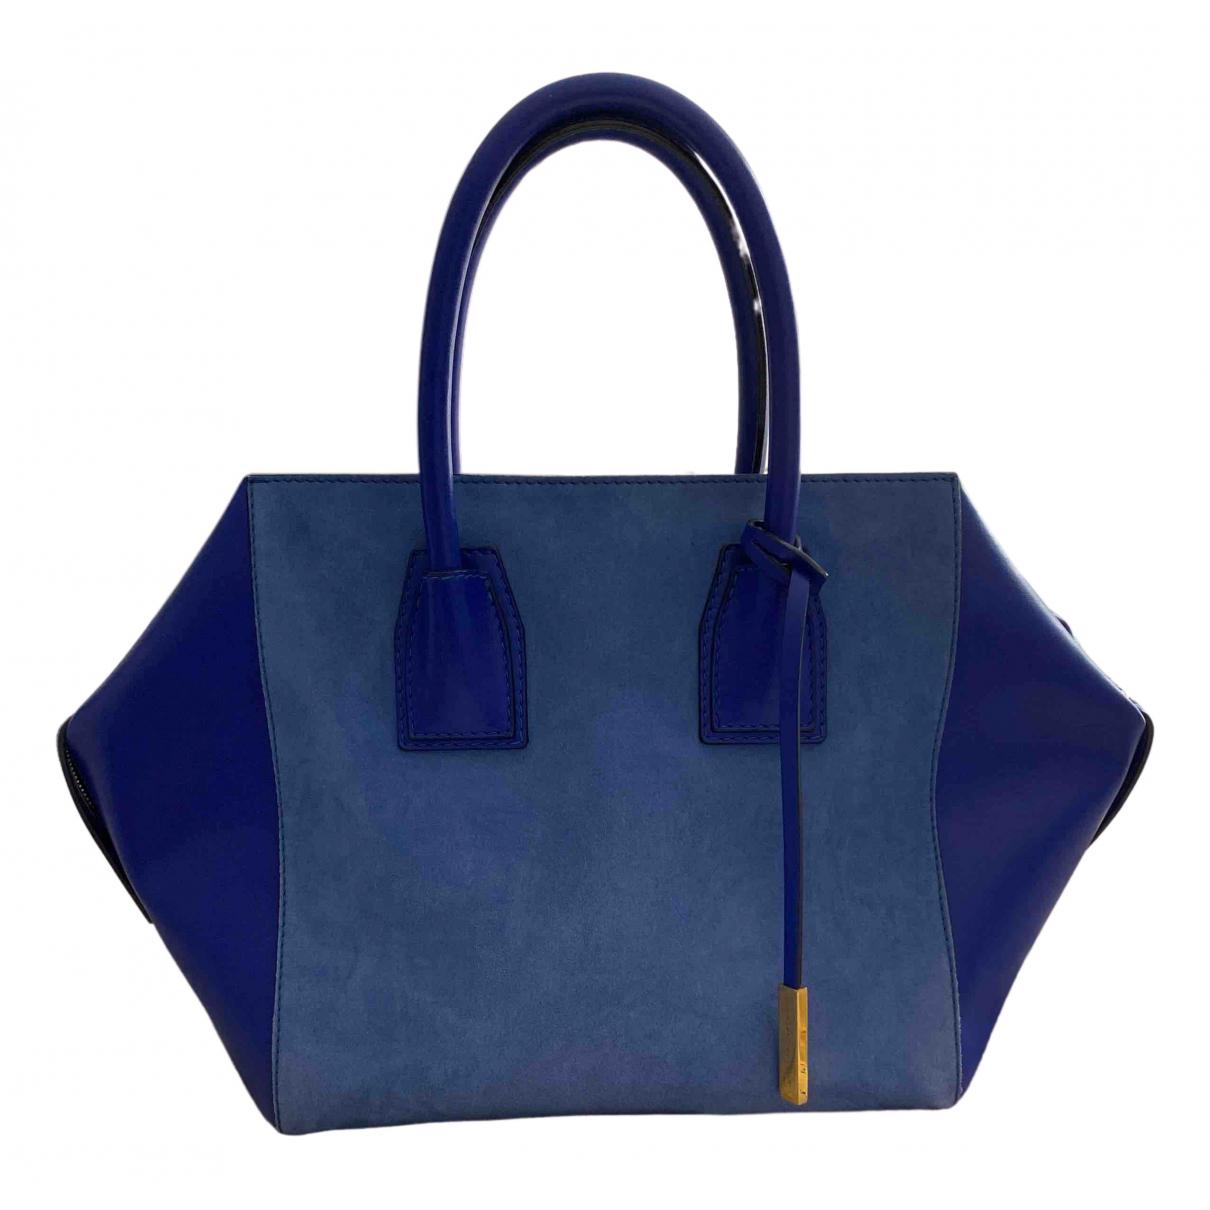 Stella Mccartney Cavendish Blue handbag for Women \N